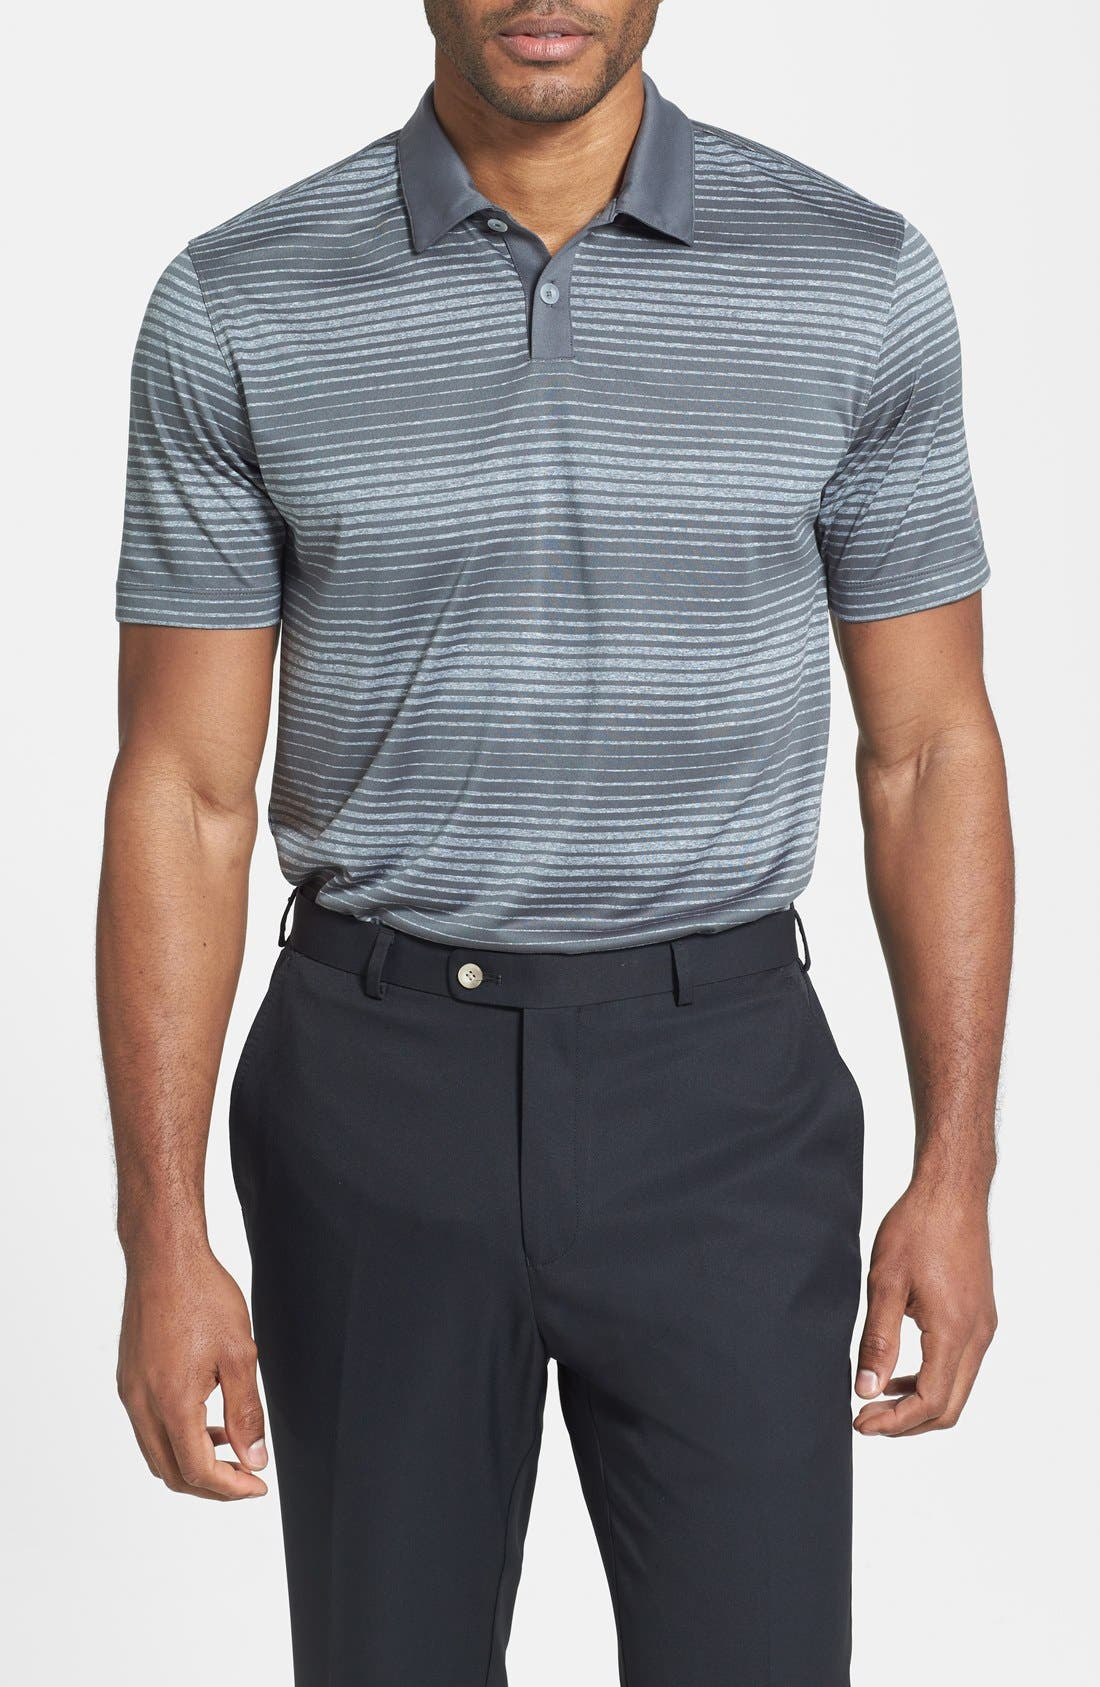 Alternate Image 1 Selected - Nike 'Innovation' Stripe Dri-FIT Polo